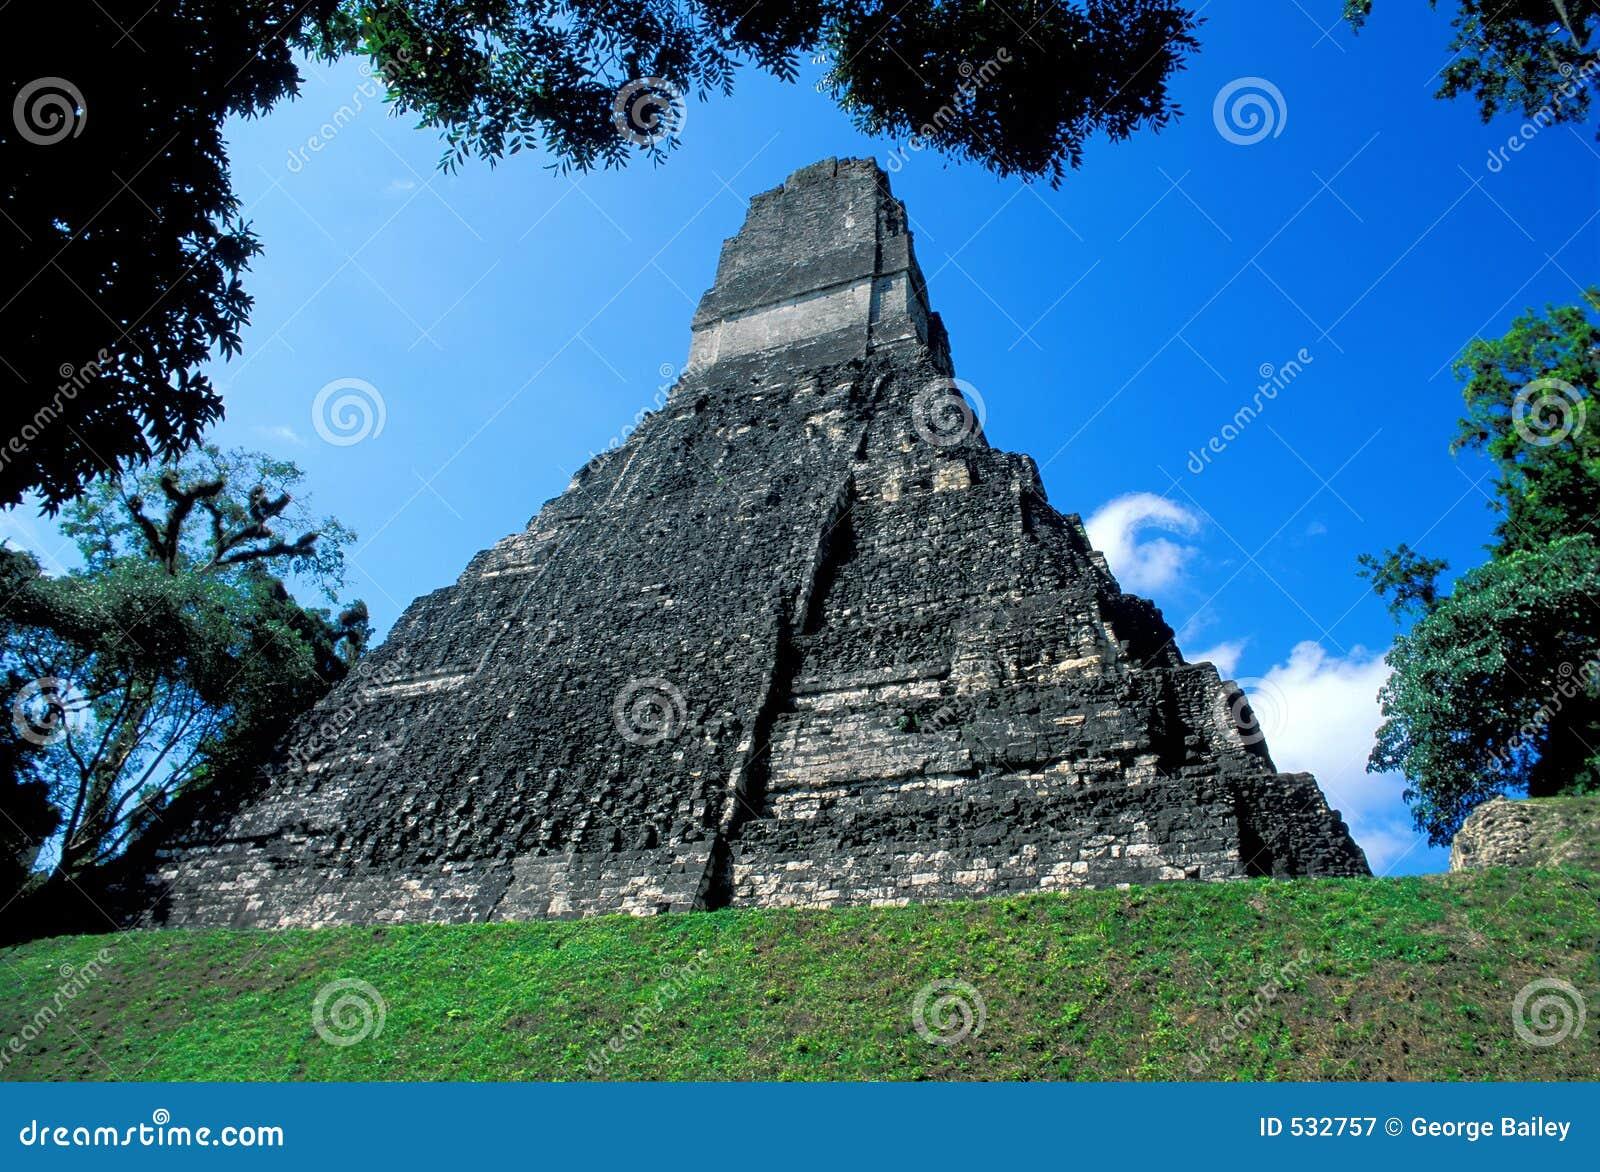 Download 我tikal的寺庙 库存图片. 图片 包括有 玛雅人, 绿色, 废墟, 文明, 危地马拉, 高地, 亚马逊, 中央 - 532757